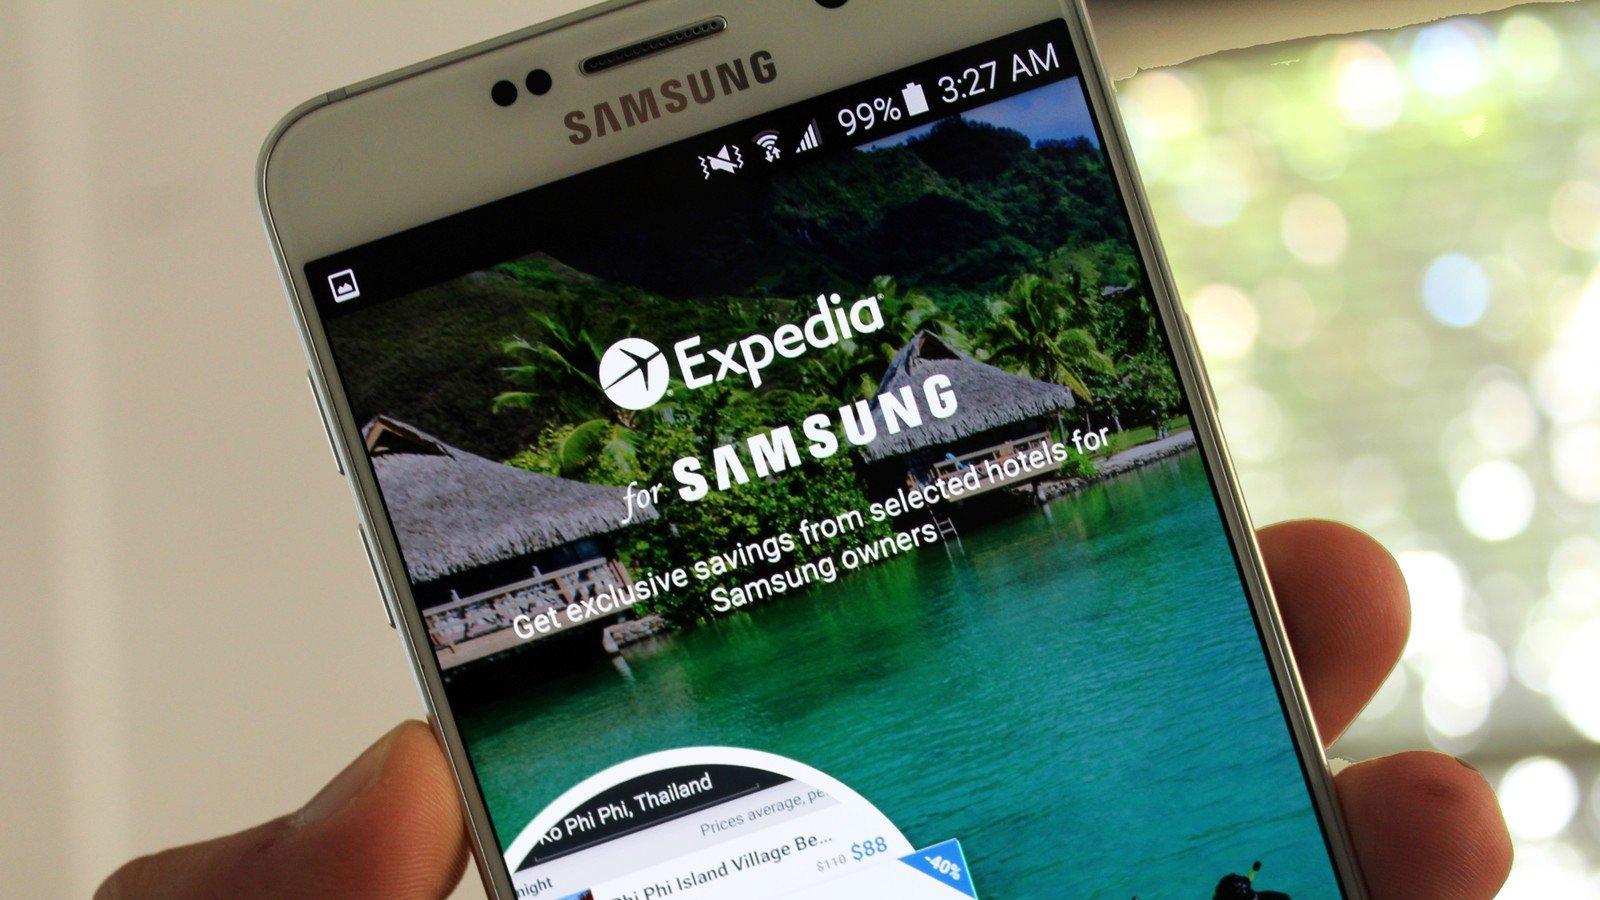 Expedia e Samsung insieme per un'app esclusiva